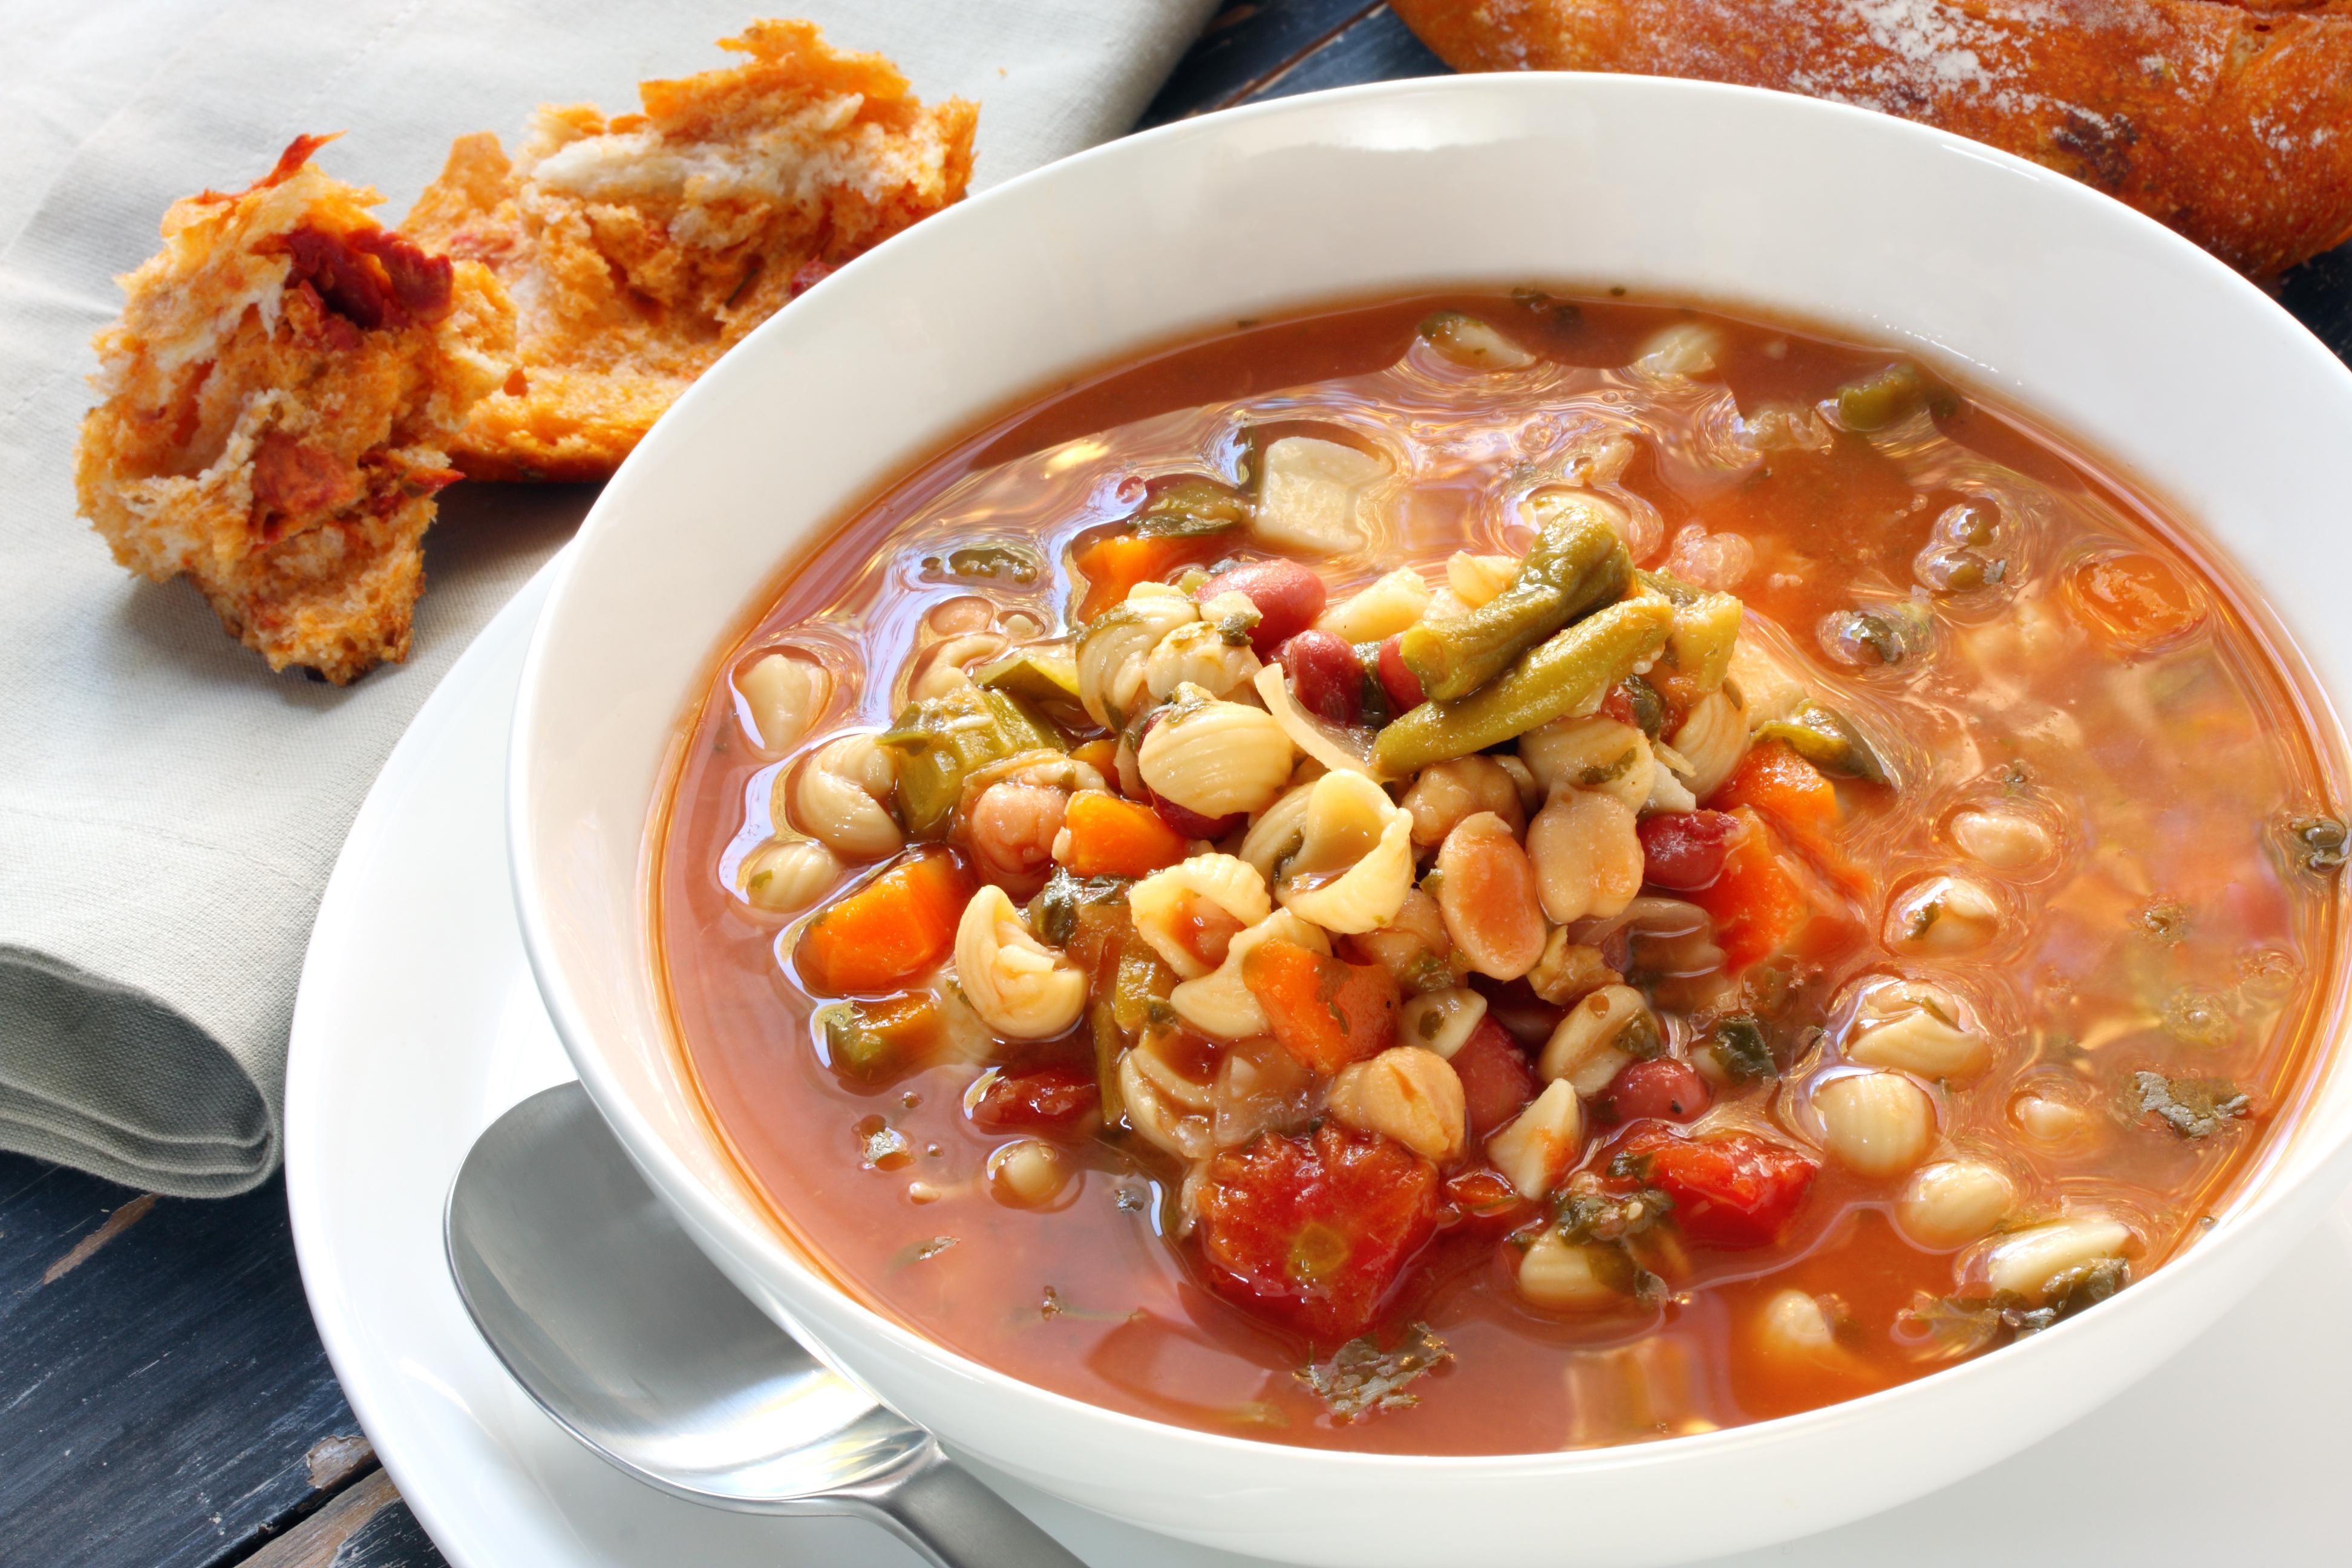 Homemade Vegetable Minestrone Soup